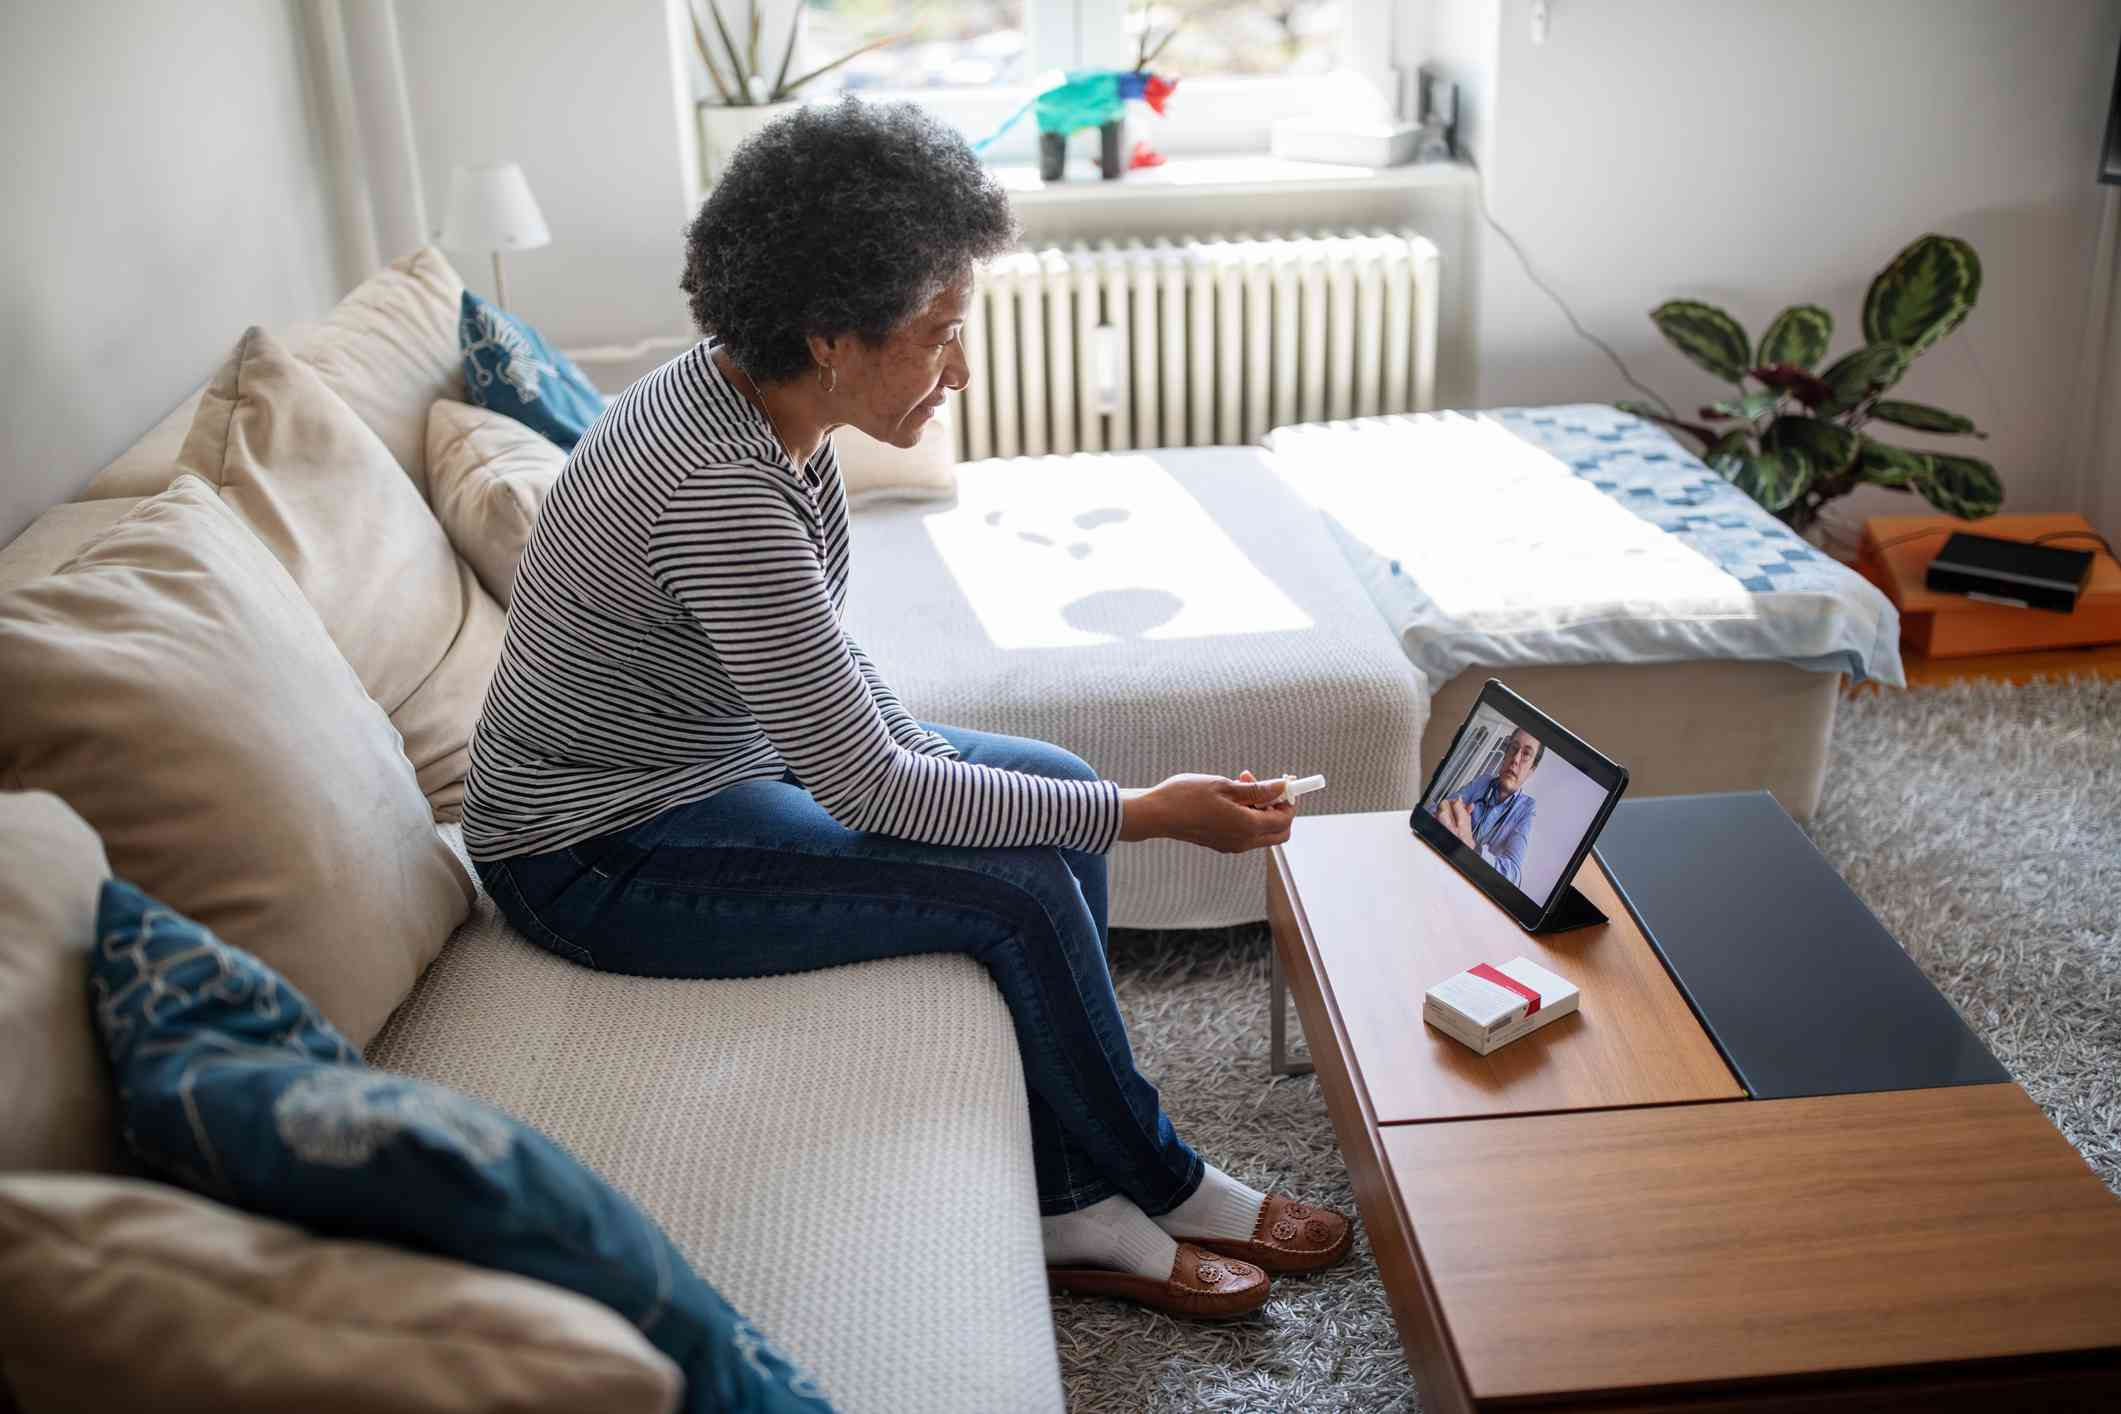 Telemedicine for rheumatoid arthritis appointments